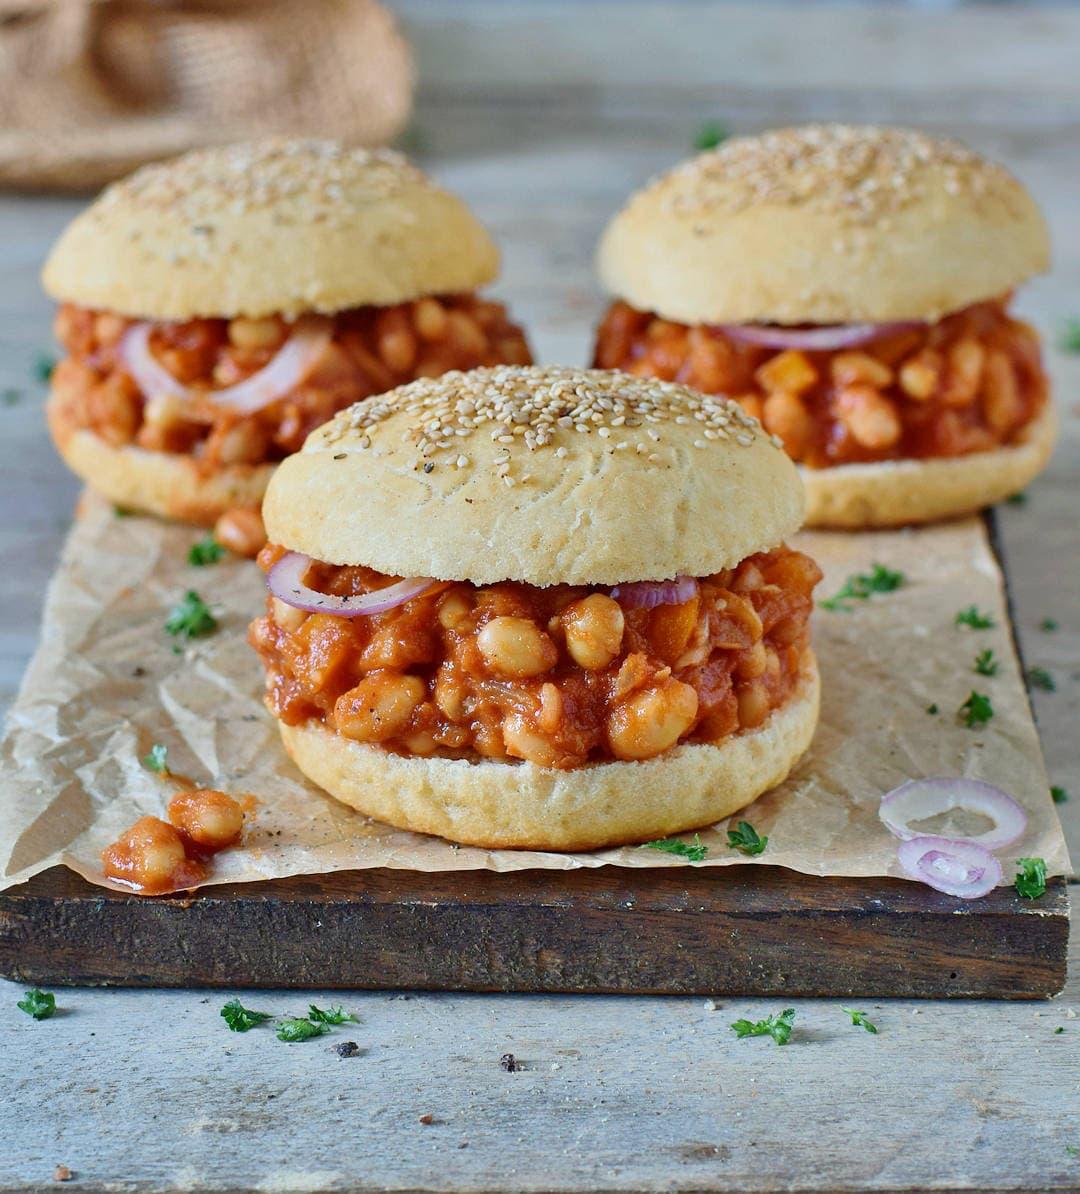 vegan sloppy joes recipe with gluten-free soft burger buns